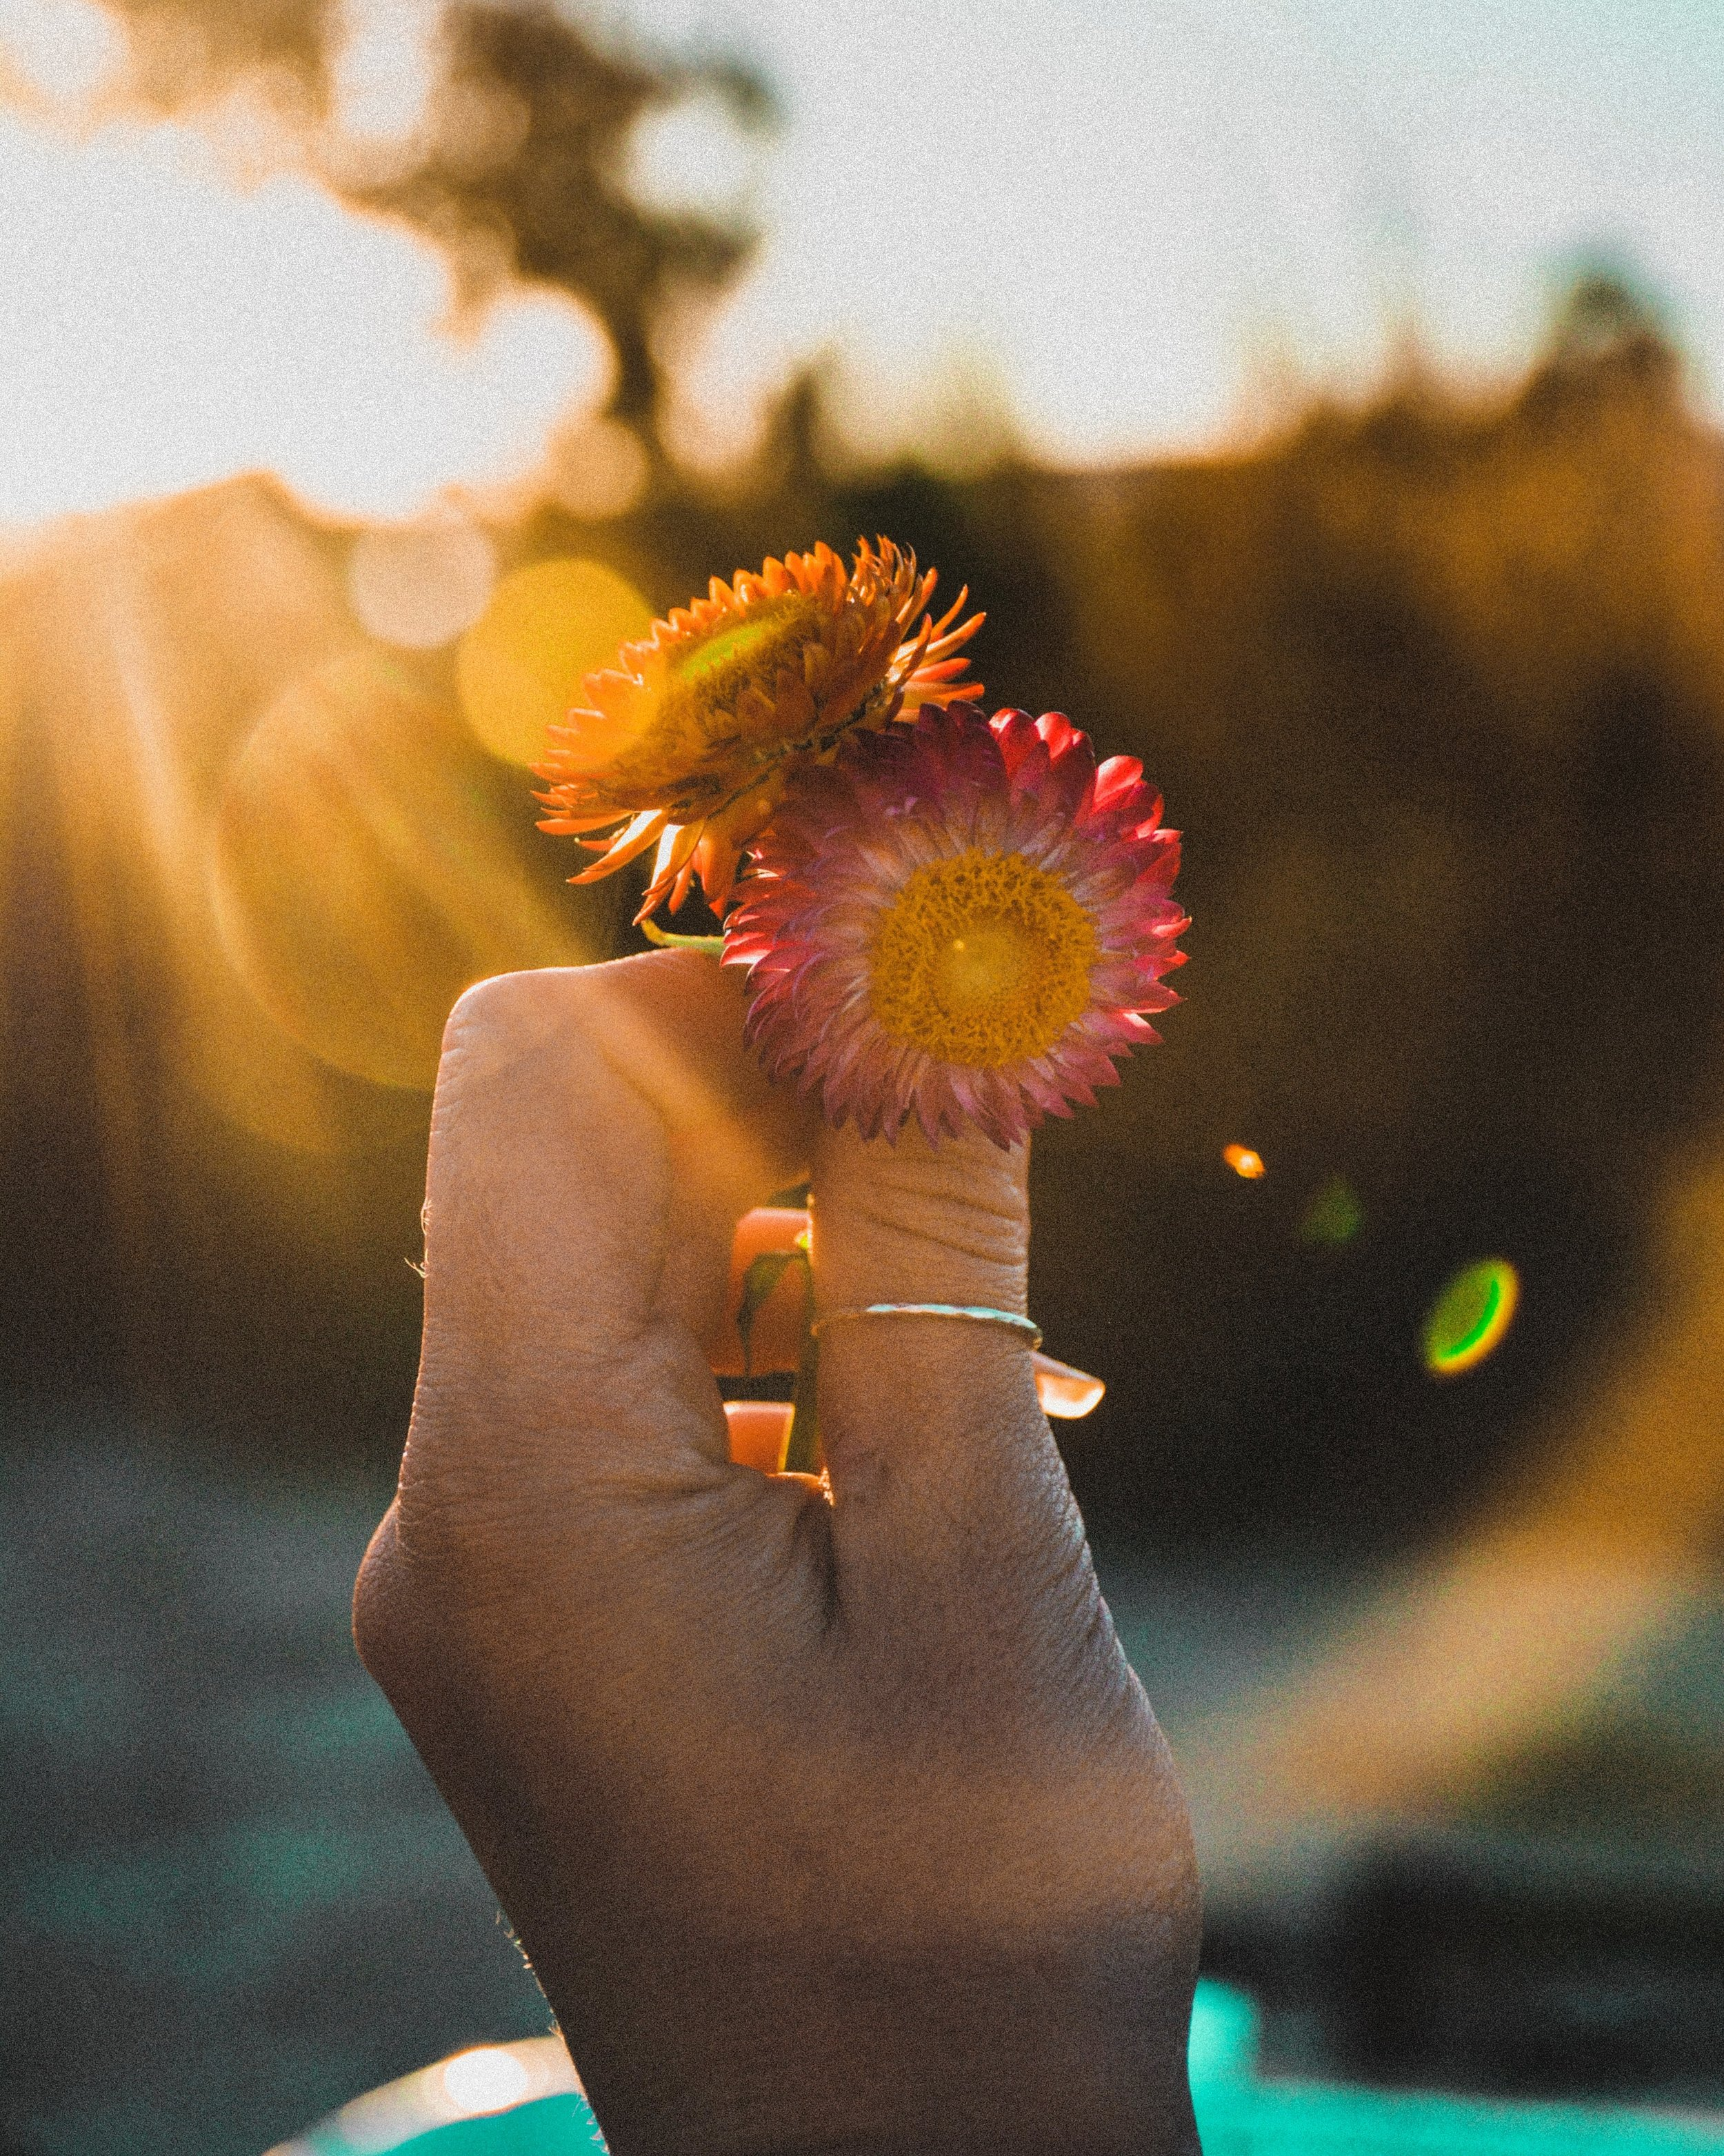 How_to_celebrate_summer_solstice.jpg